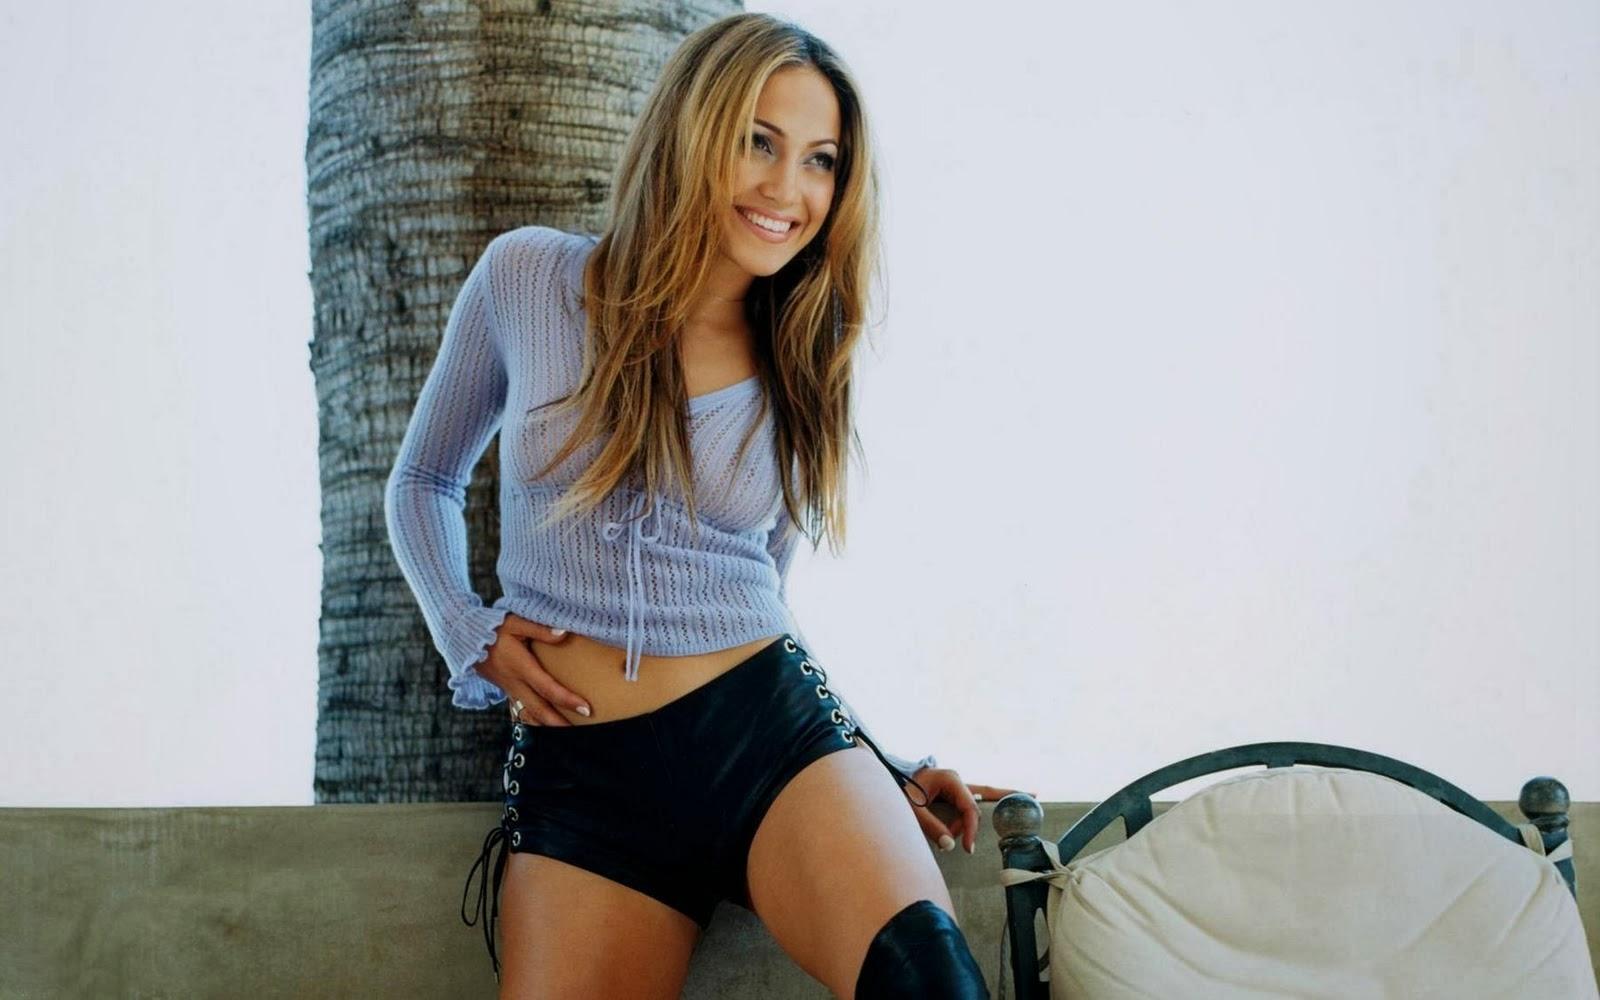 Katrina Kaif Cute Face Hd Wallpapers Celebrity Hd Wallpapers American Singer Jennifer Lopez Hd